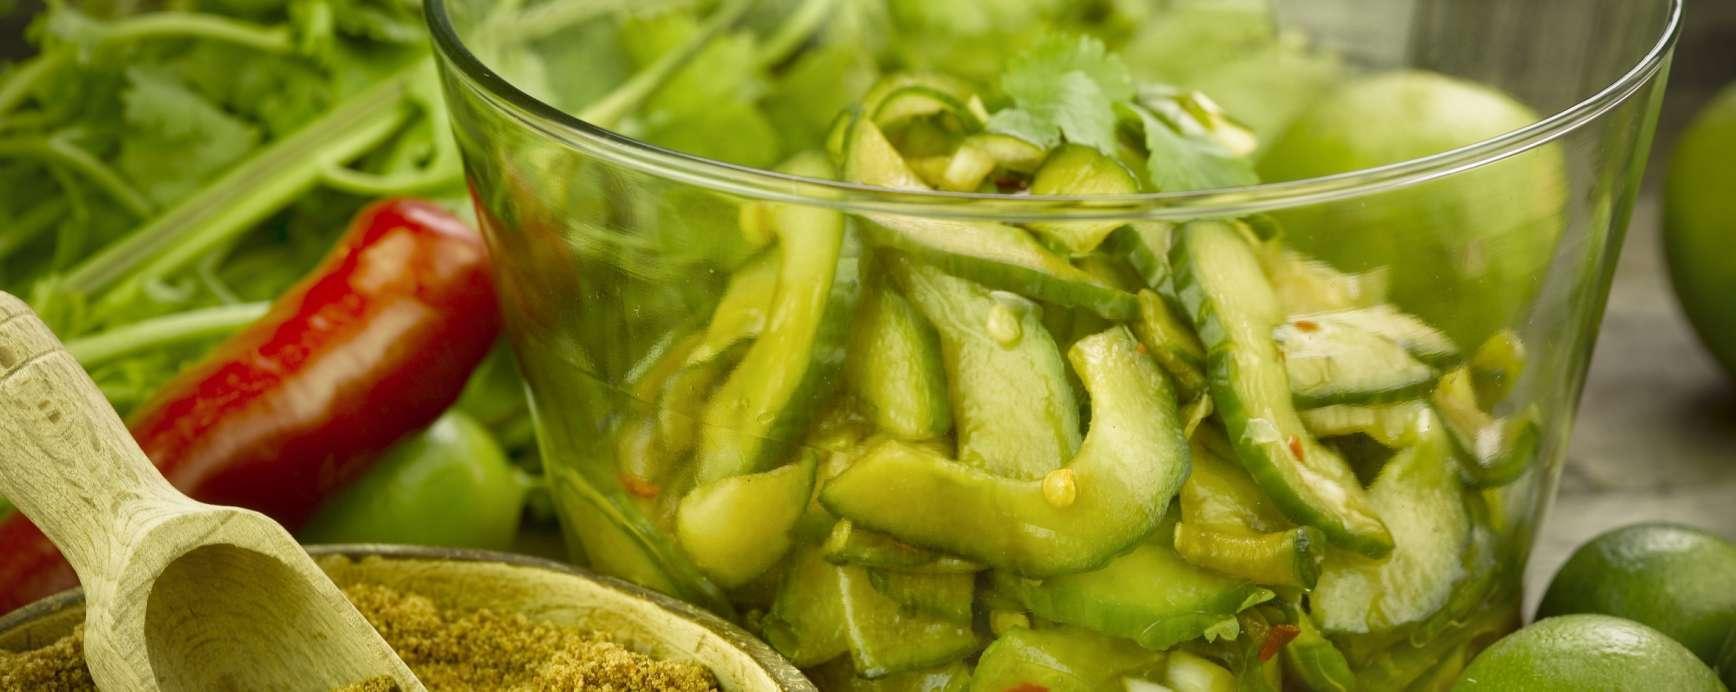 Thaise salade van komkommer met kokosbloesemsuiker